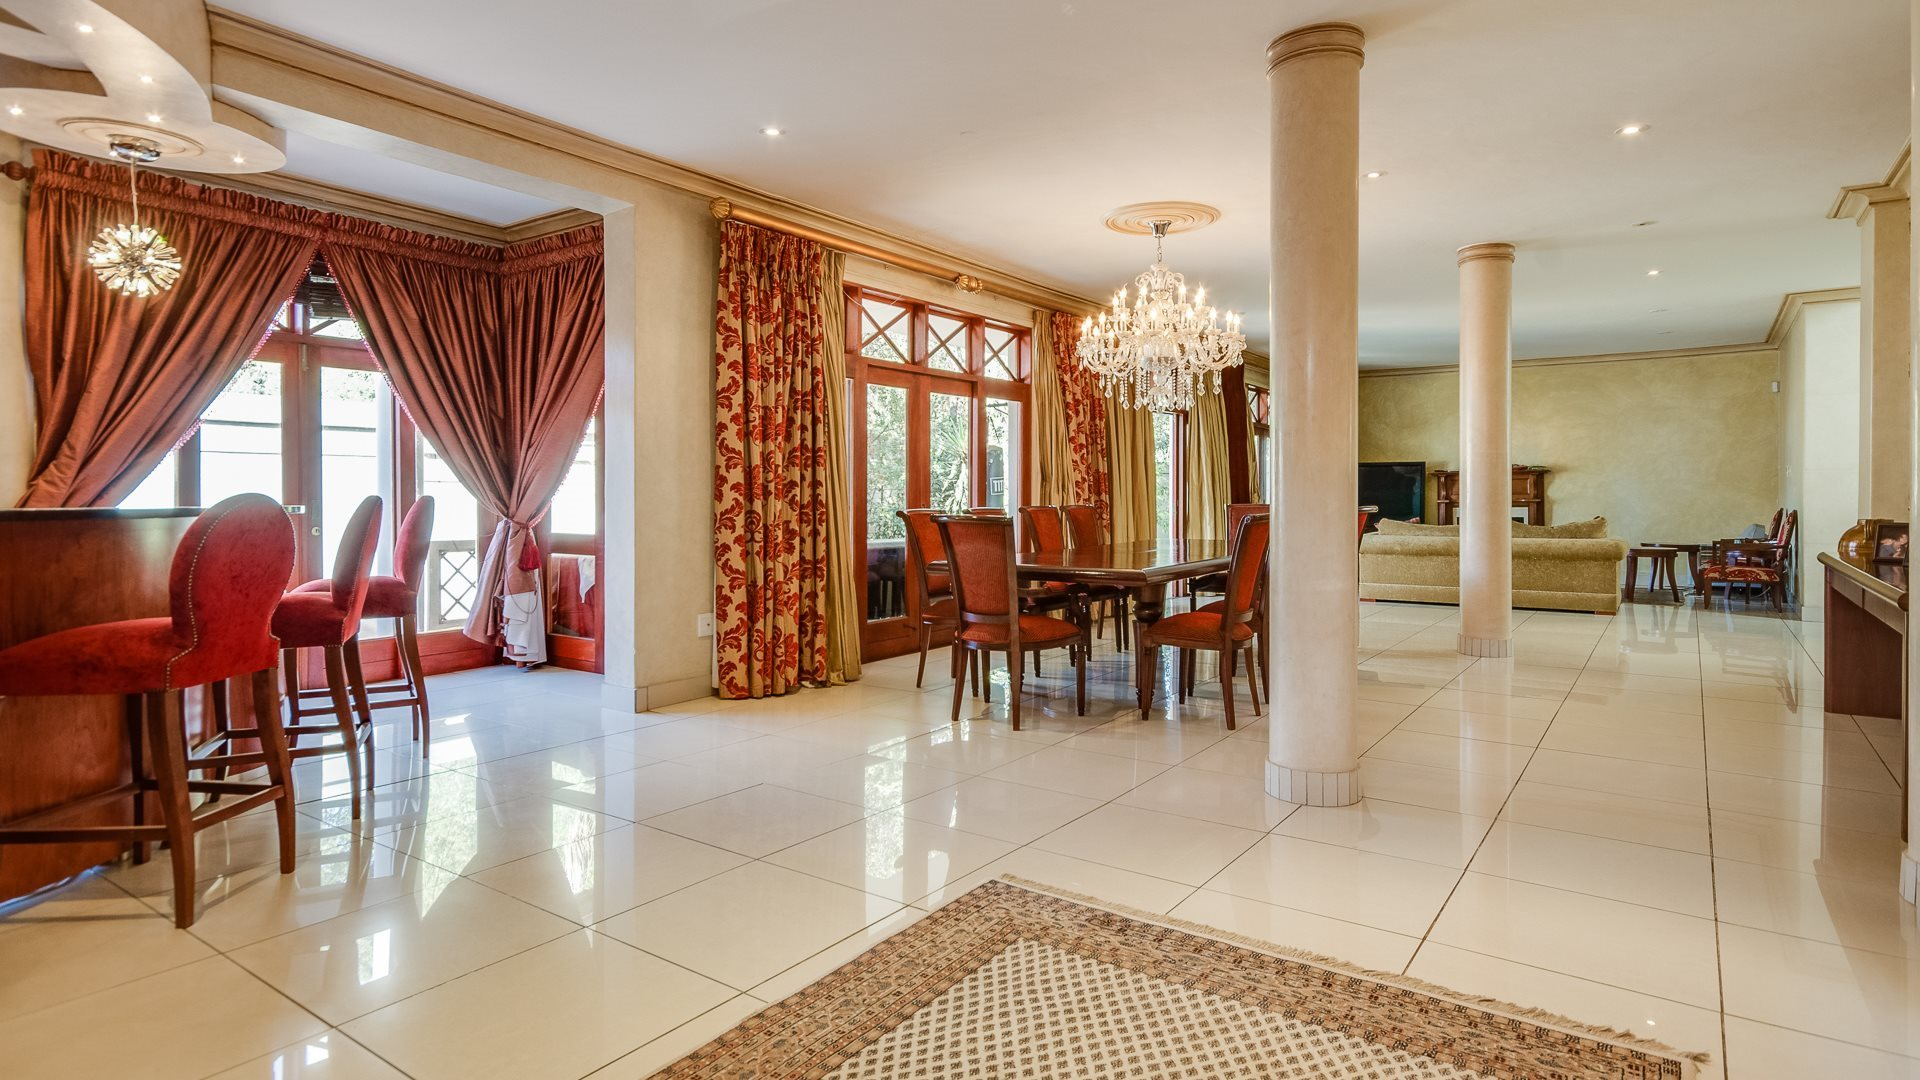 Houghton Estate property for sale. Ref No: 13527223. Picture no 1